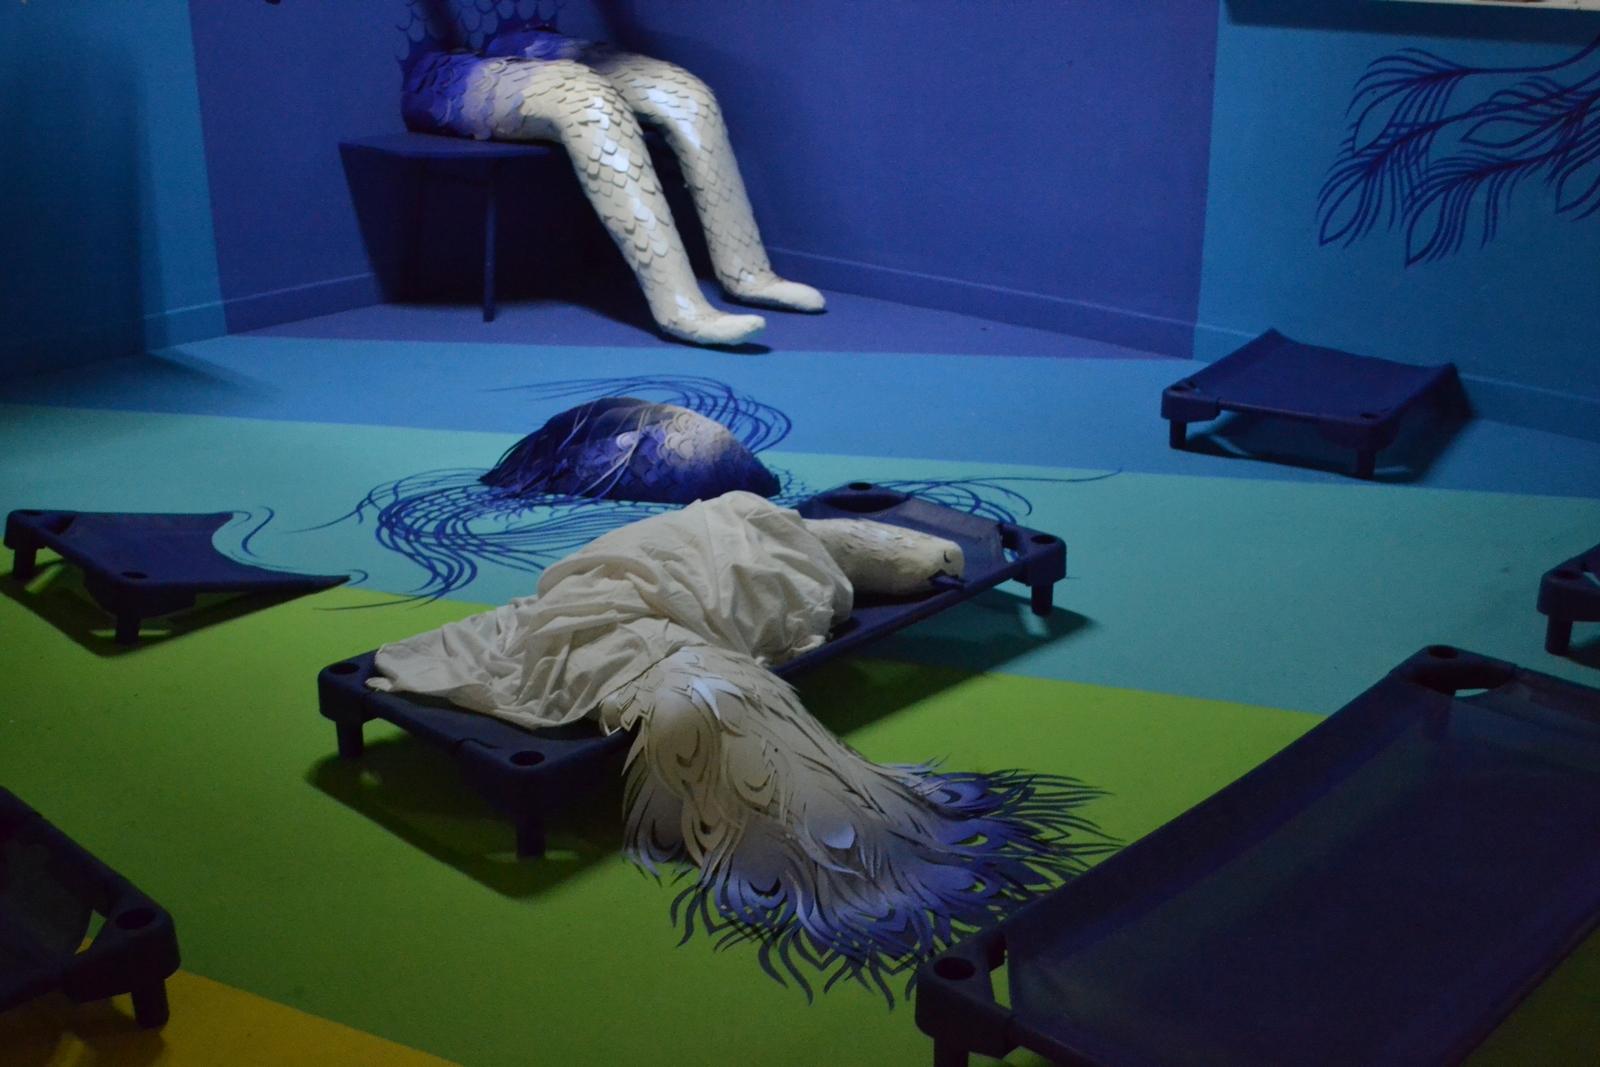 L'heure de la sieste, par Olivia De Bona. ©MD